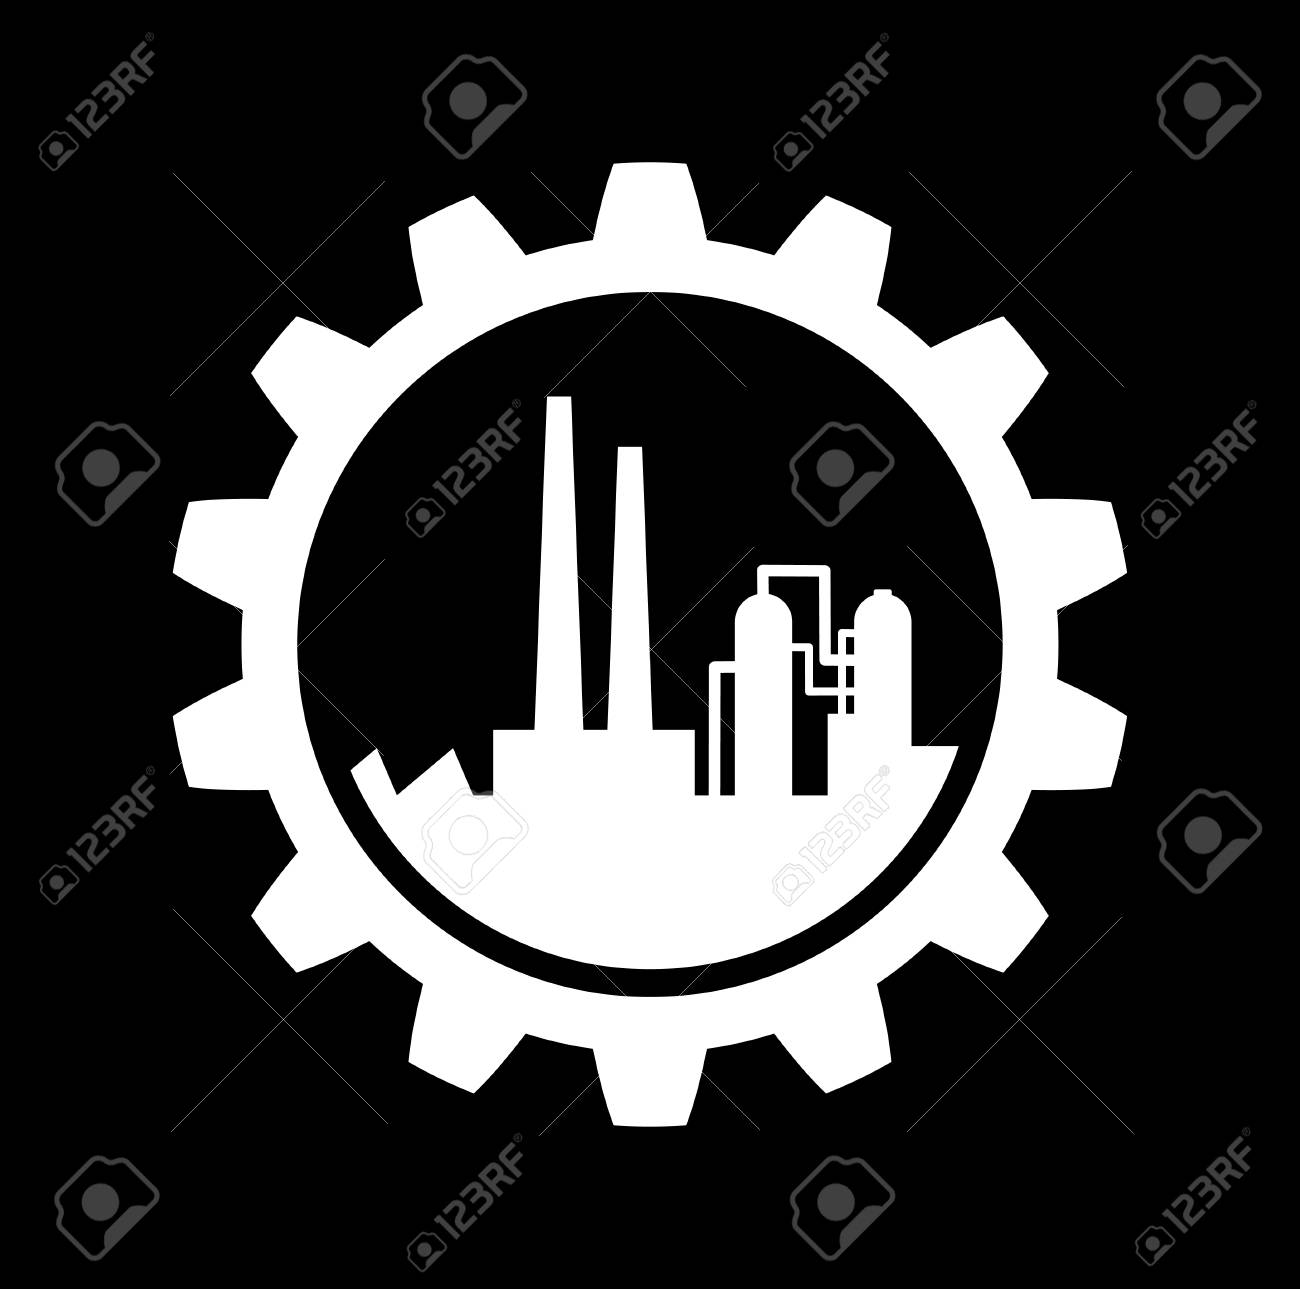 Industrial icon Stock Vector - 22786040